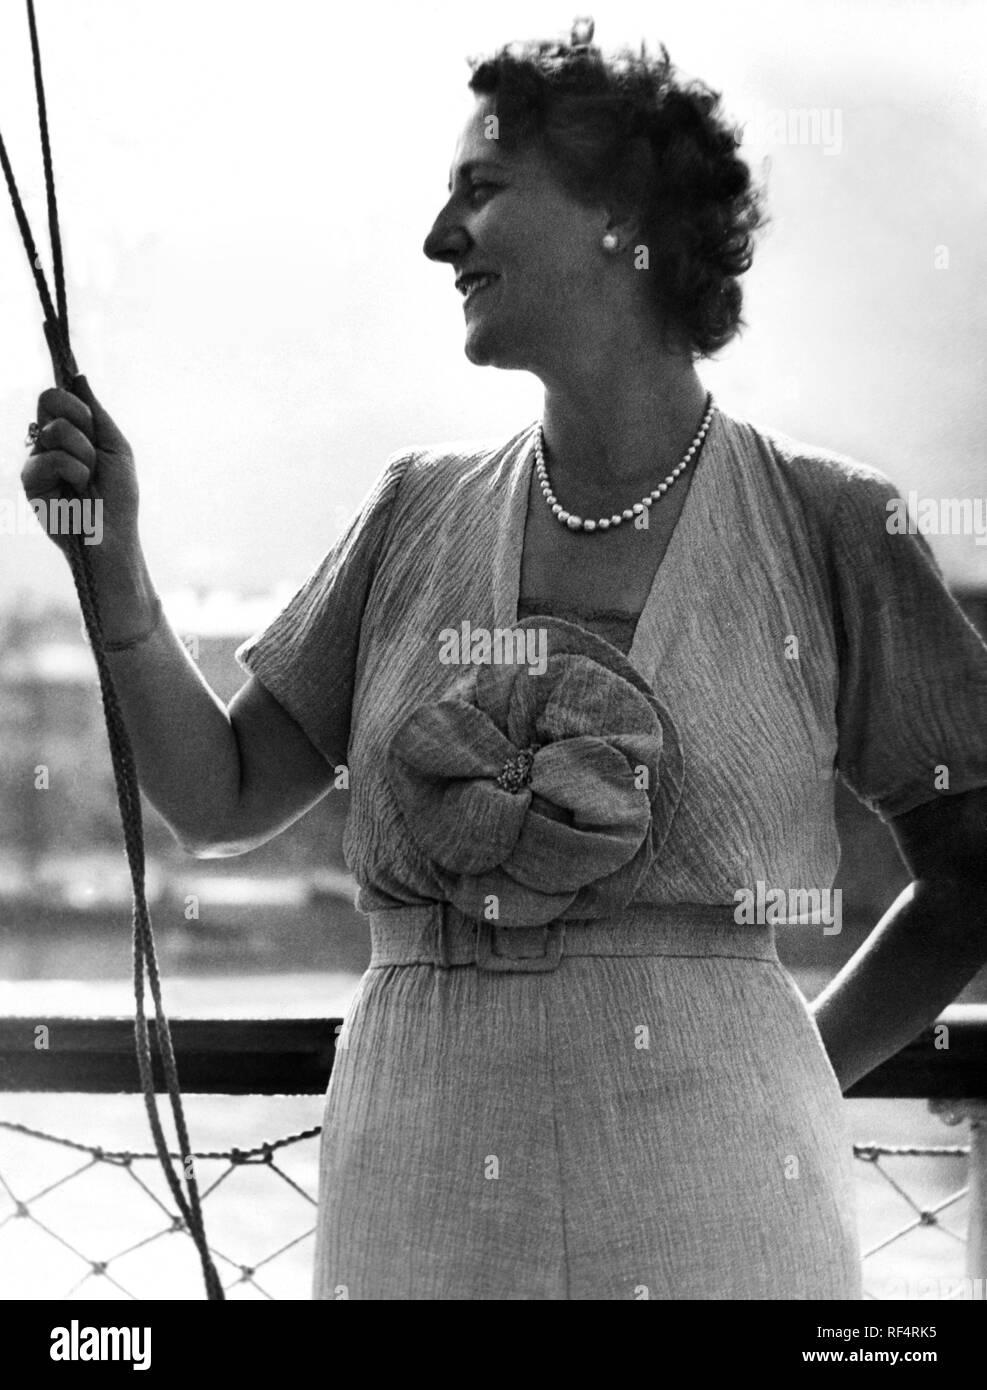 maria cristina bezzi-scali, 1936 Stock Photo